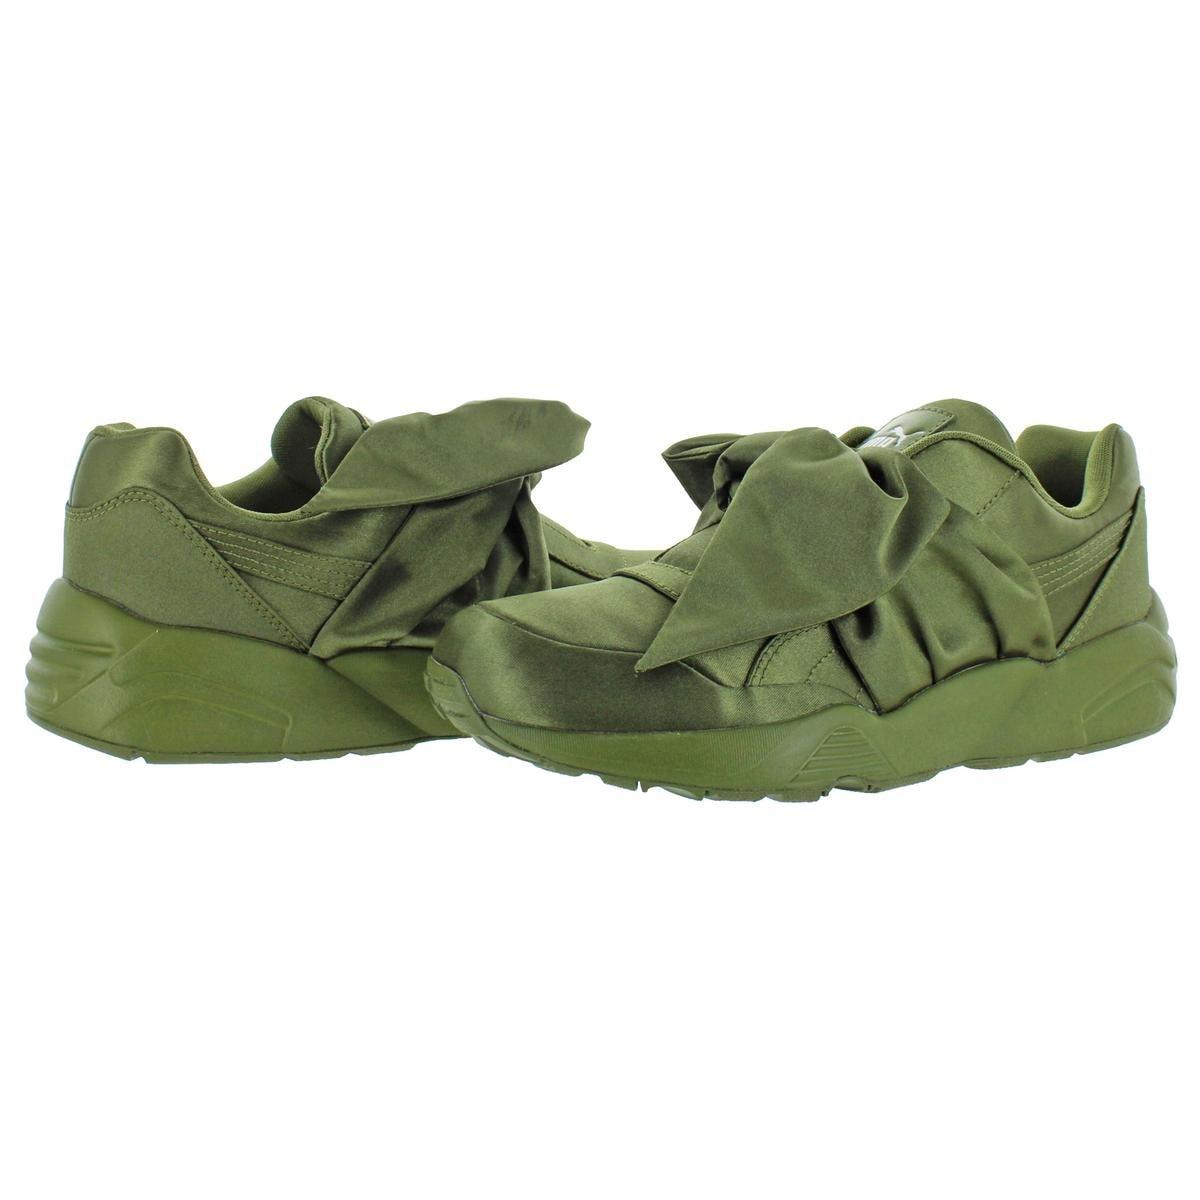 best service ea5ae 337e1 Fenty Puma by Rihanna Womens Bow Sneaker Fashion Sneakers Satin Bow